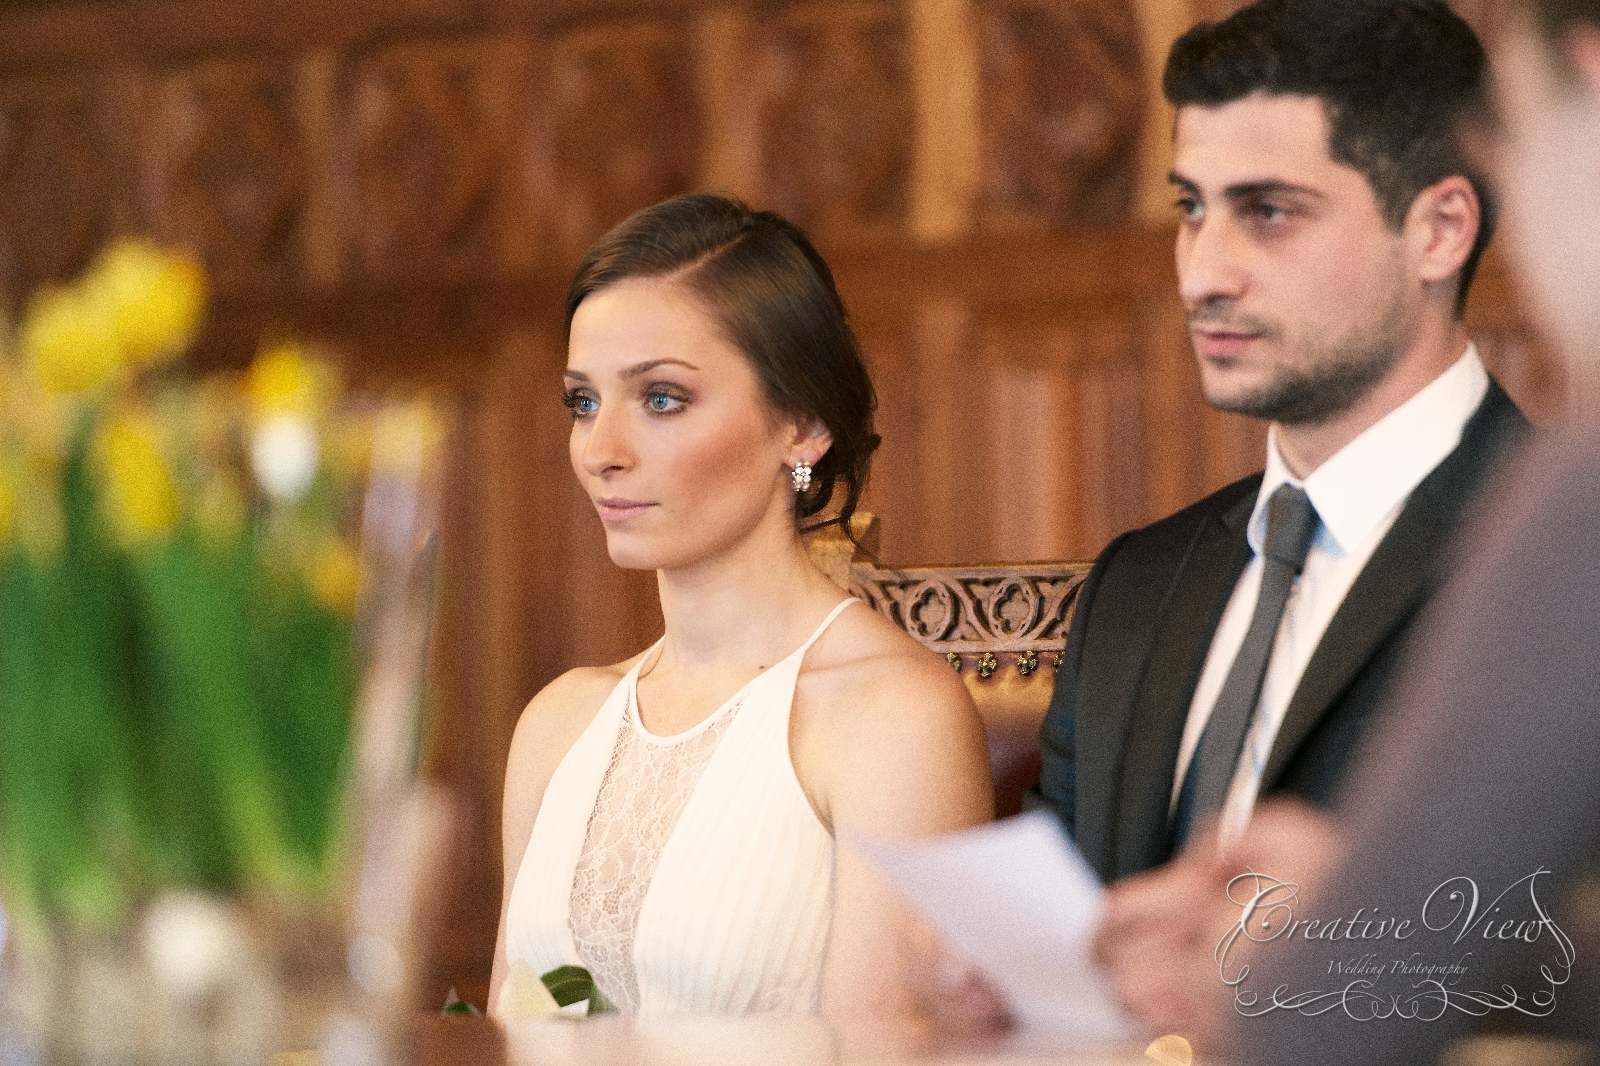 Photographe-mariage-eaux-vives04